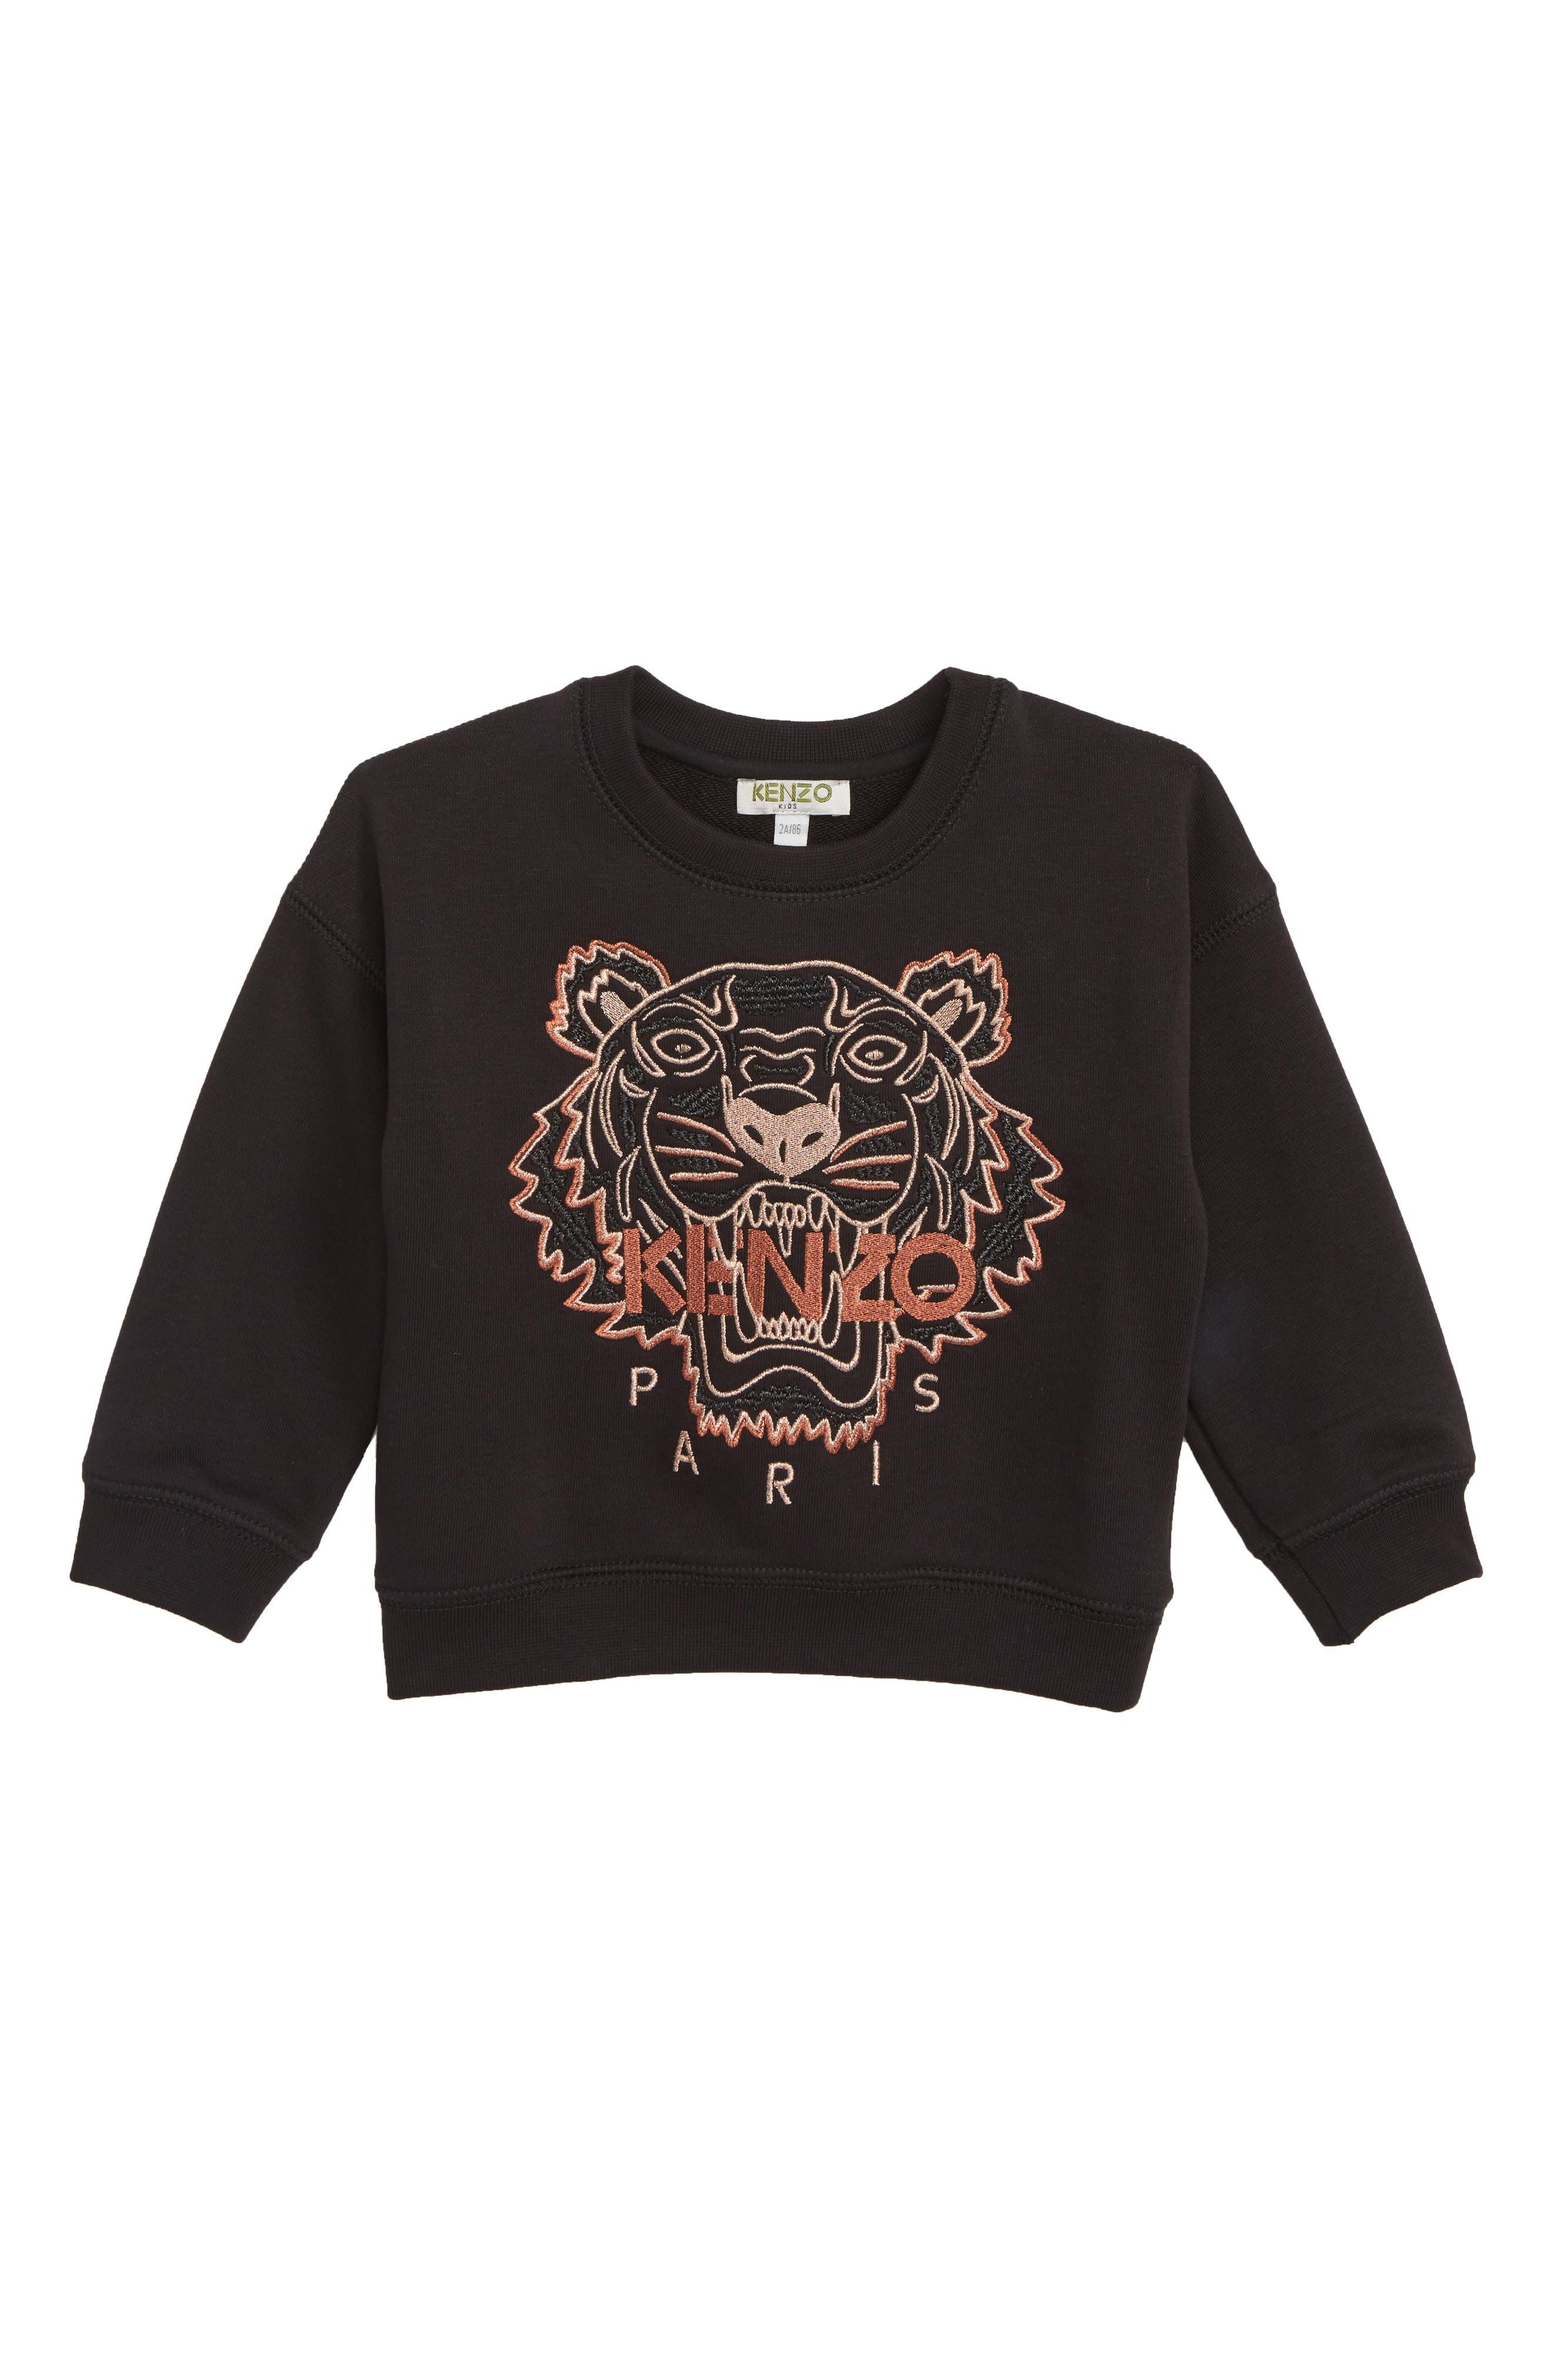 Girls Kenzo Tiger Embroidered Sweatshirt Size 16Y  Black